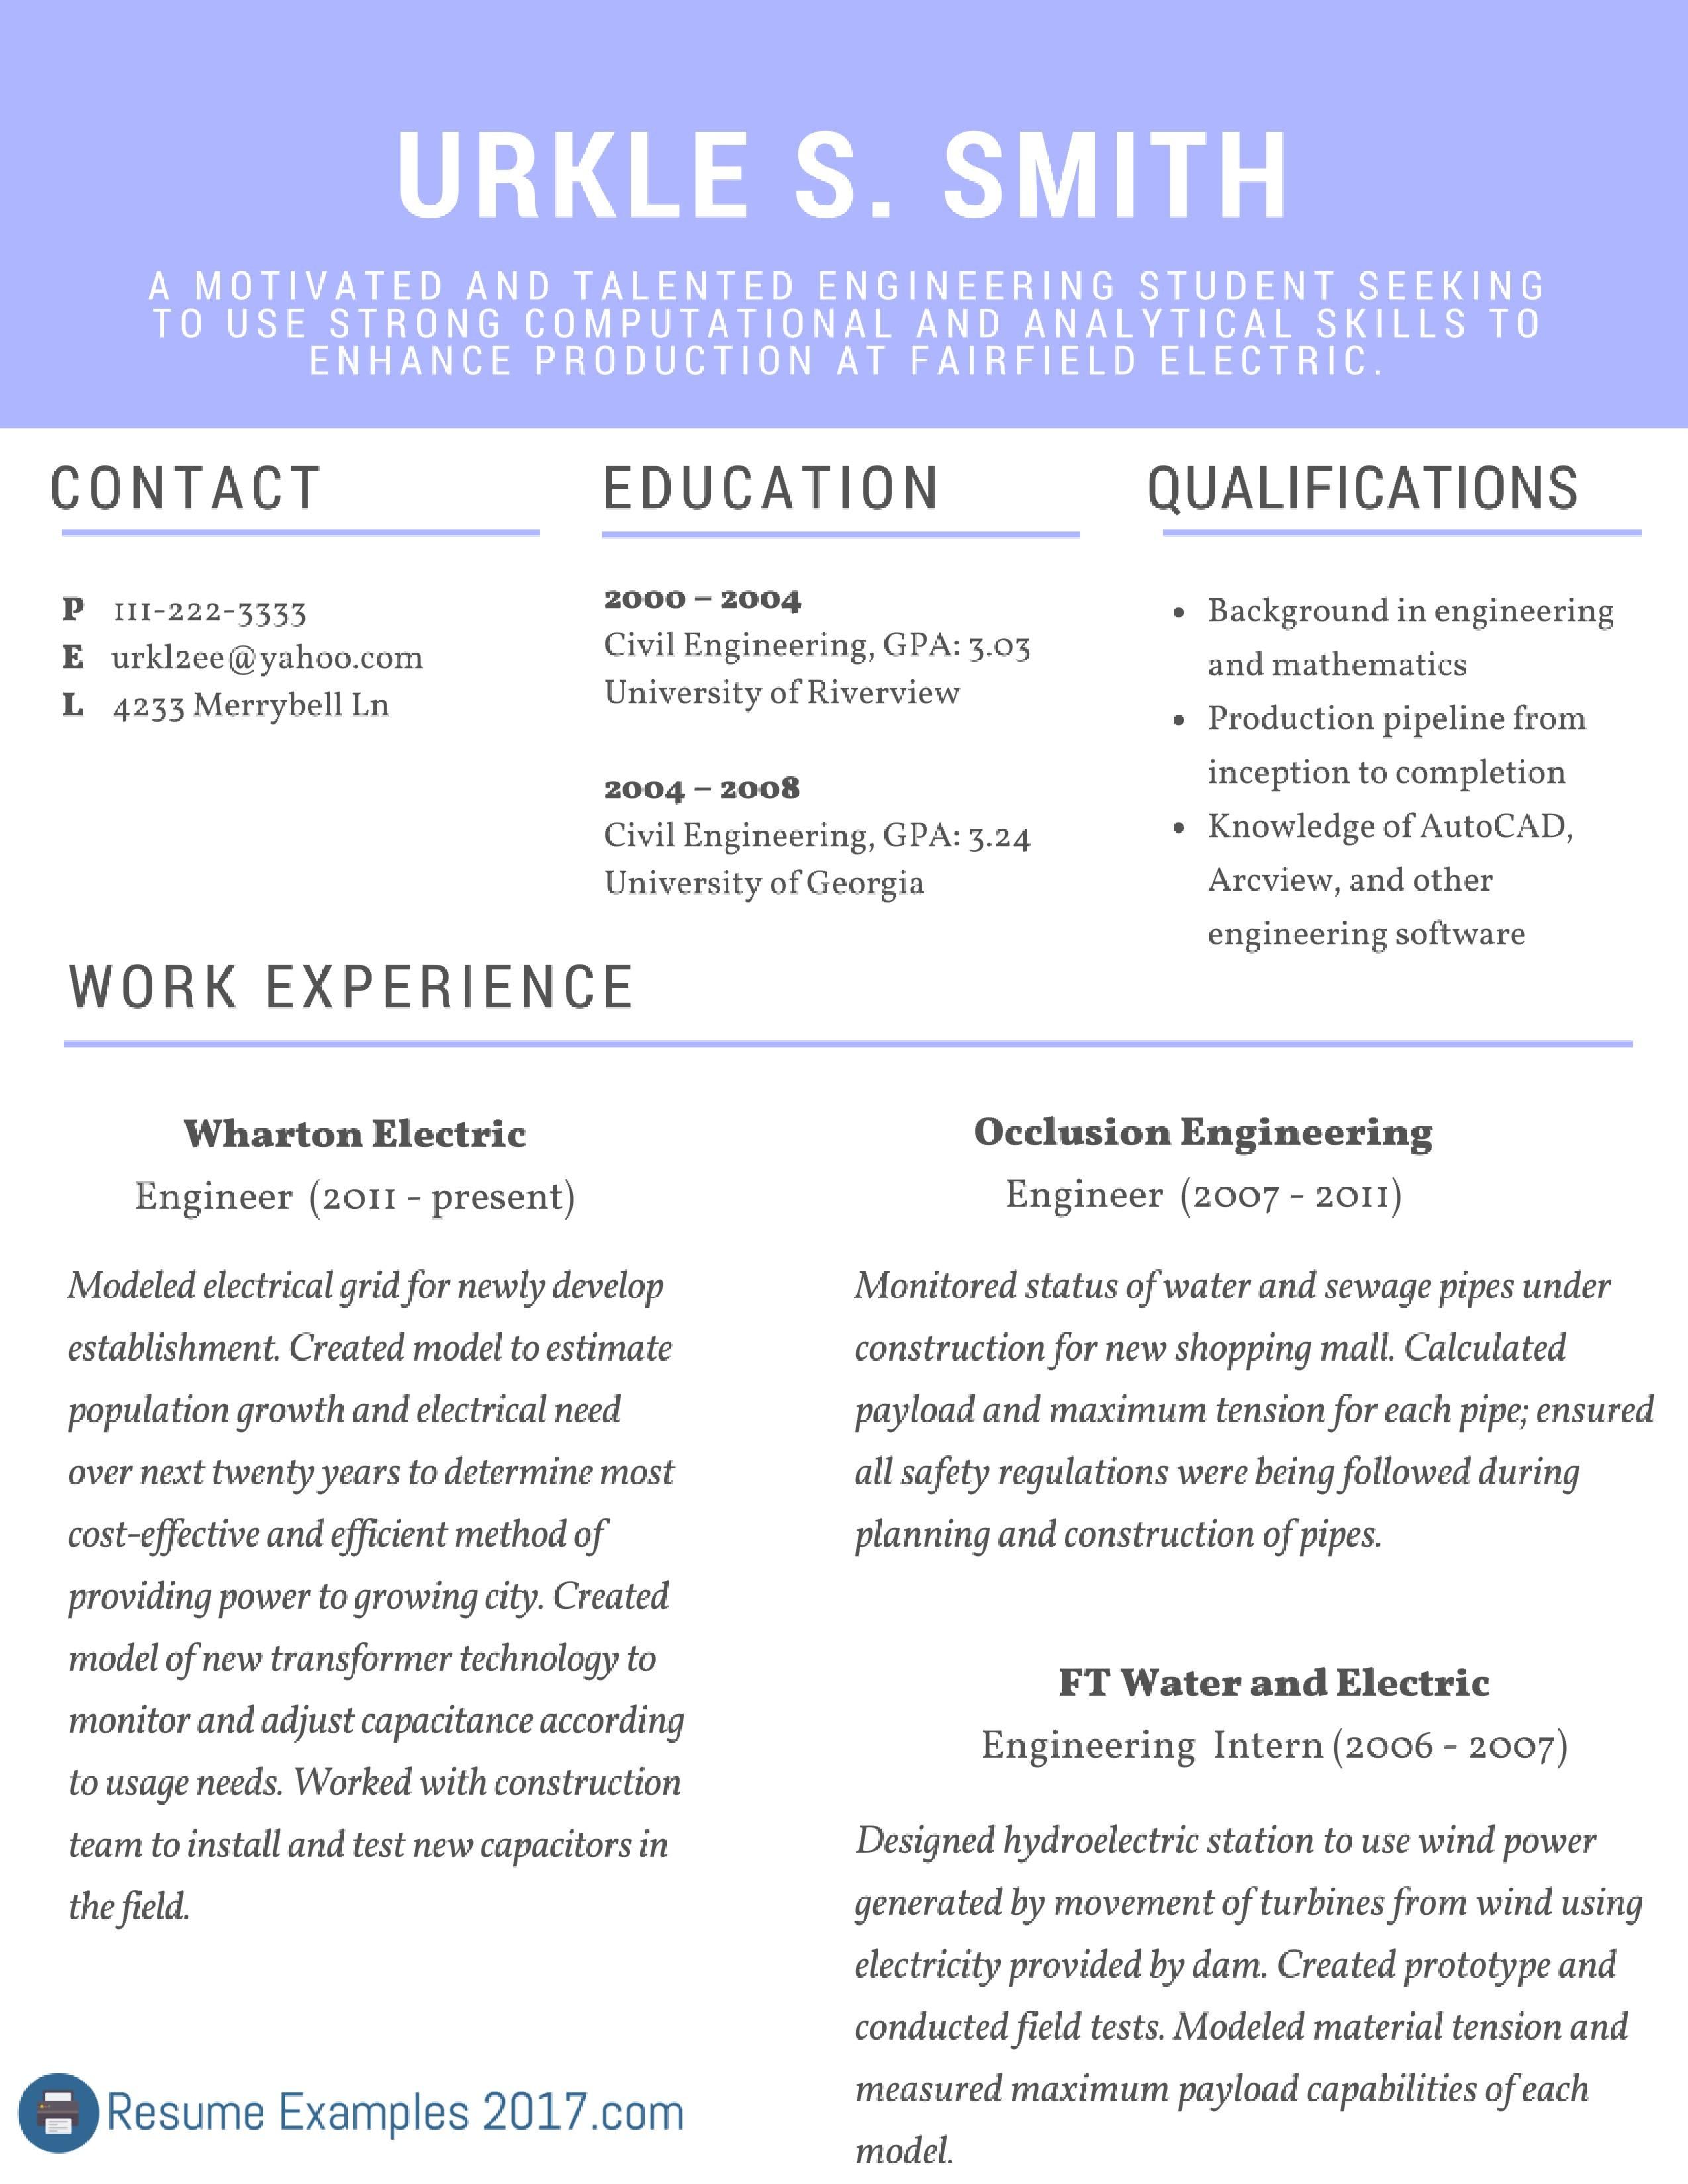 Curriculum Vitae Sample For Fresh Graduate Civil Engineer Neu Resume